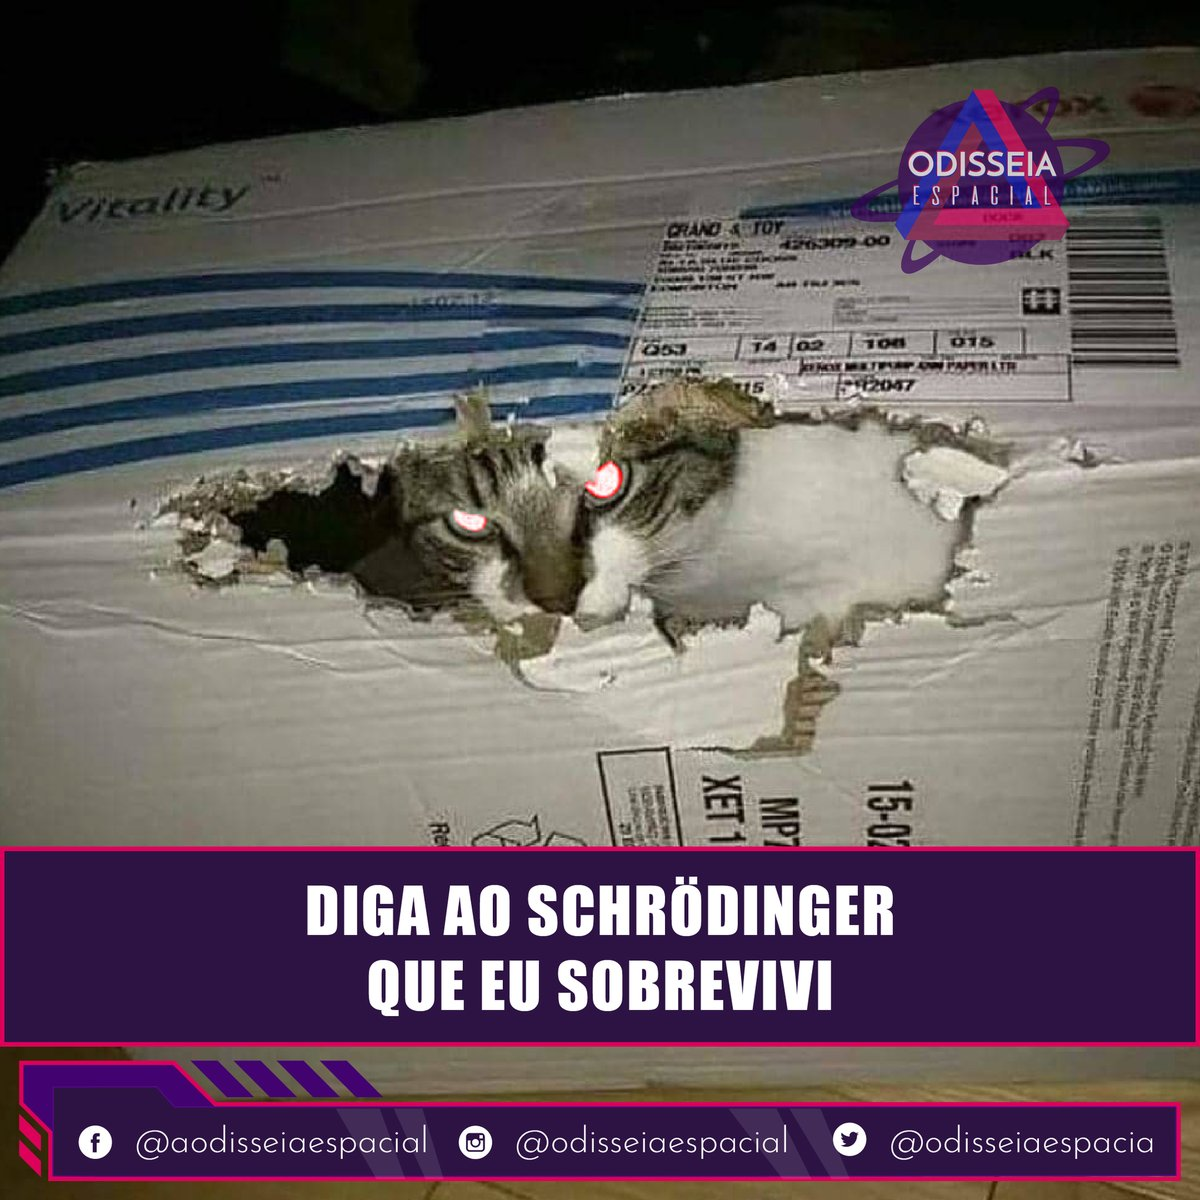 Corre Schrödinger ele sobreviveu.  #meme #memeastronomico #memes #memesdeastronomia #memefun #memeengraçado #funny #lolpic.twitter.com/4G10lKA1kX